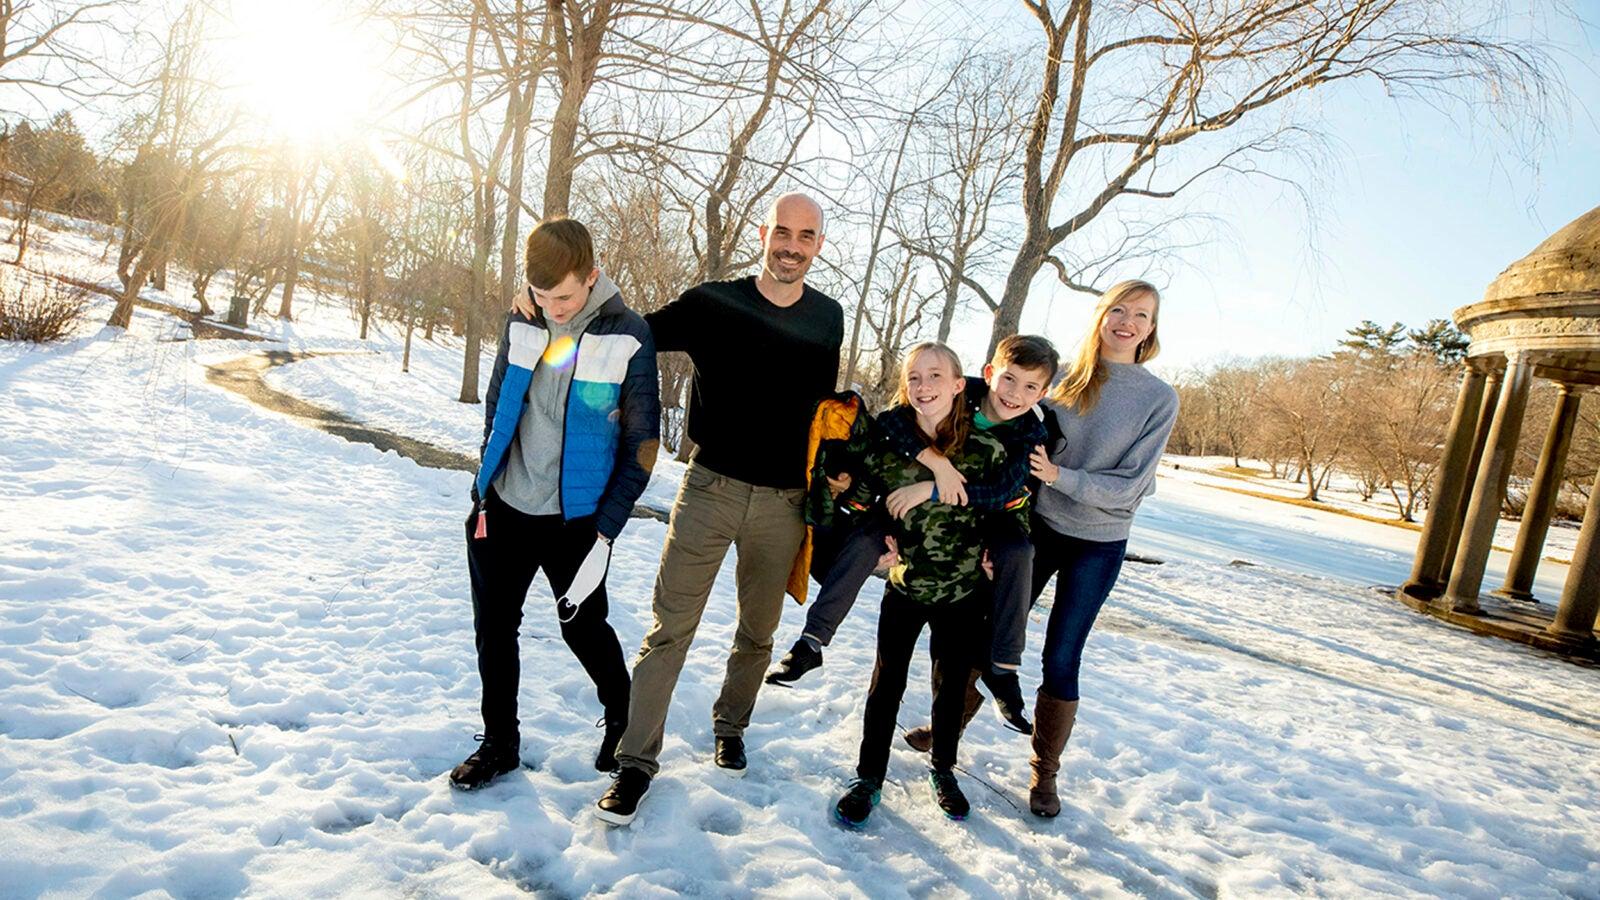 Joseph Allen and his family.